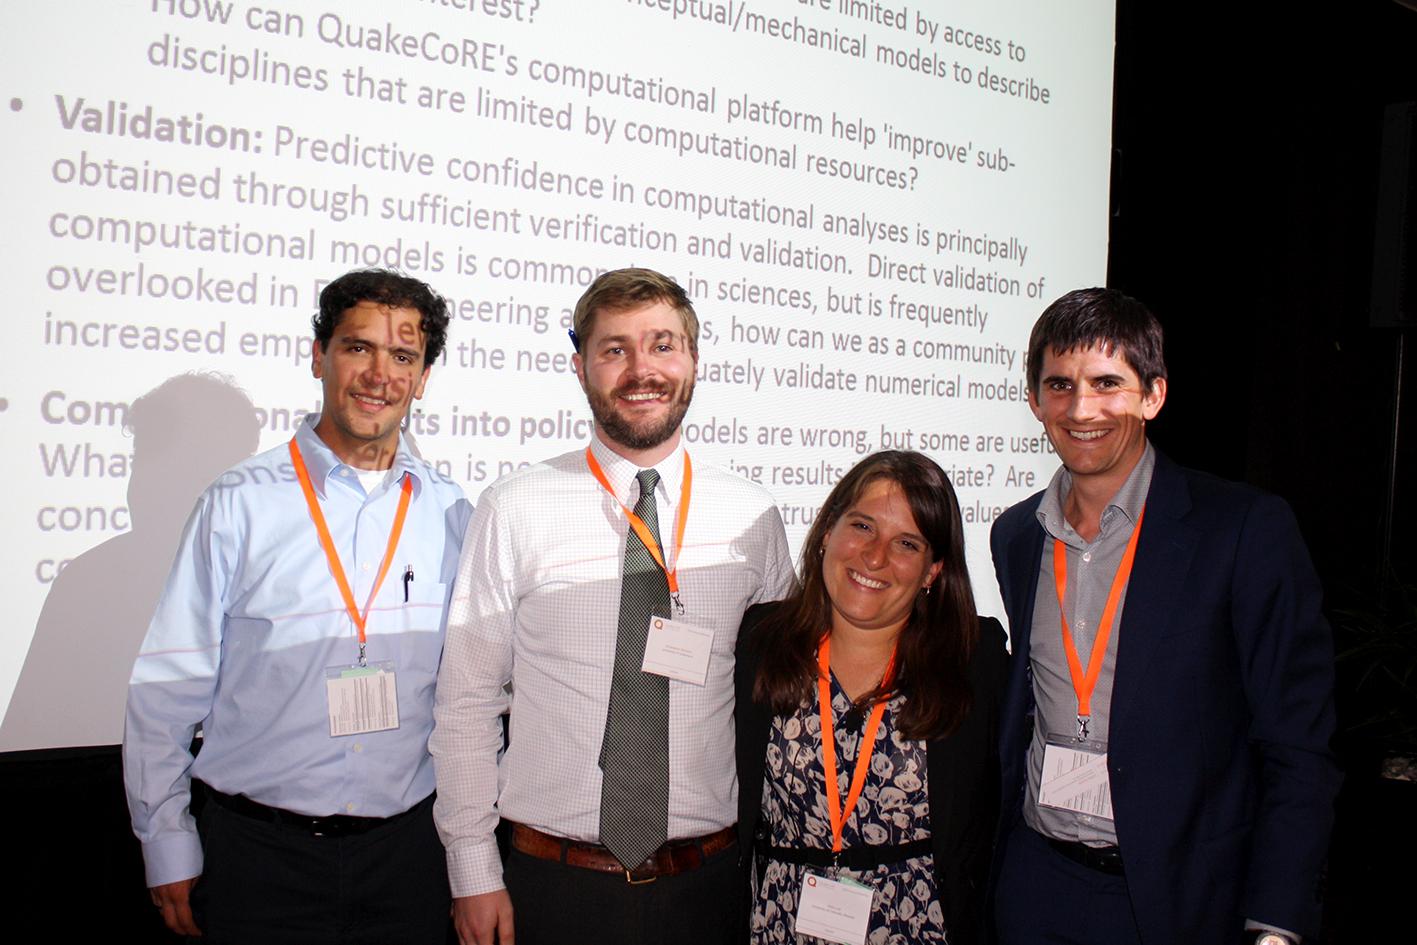 Moderator: Ricardo Taborda, Speaker: Chris McGann, Abbie Liel, Moderator and QuakeCore Deputy Director: Brendon Bradley